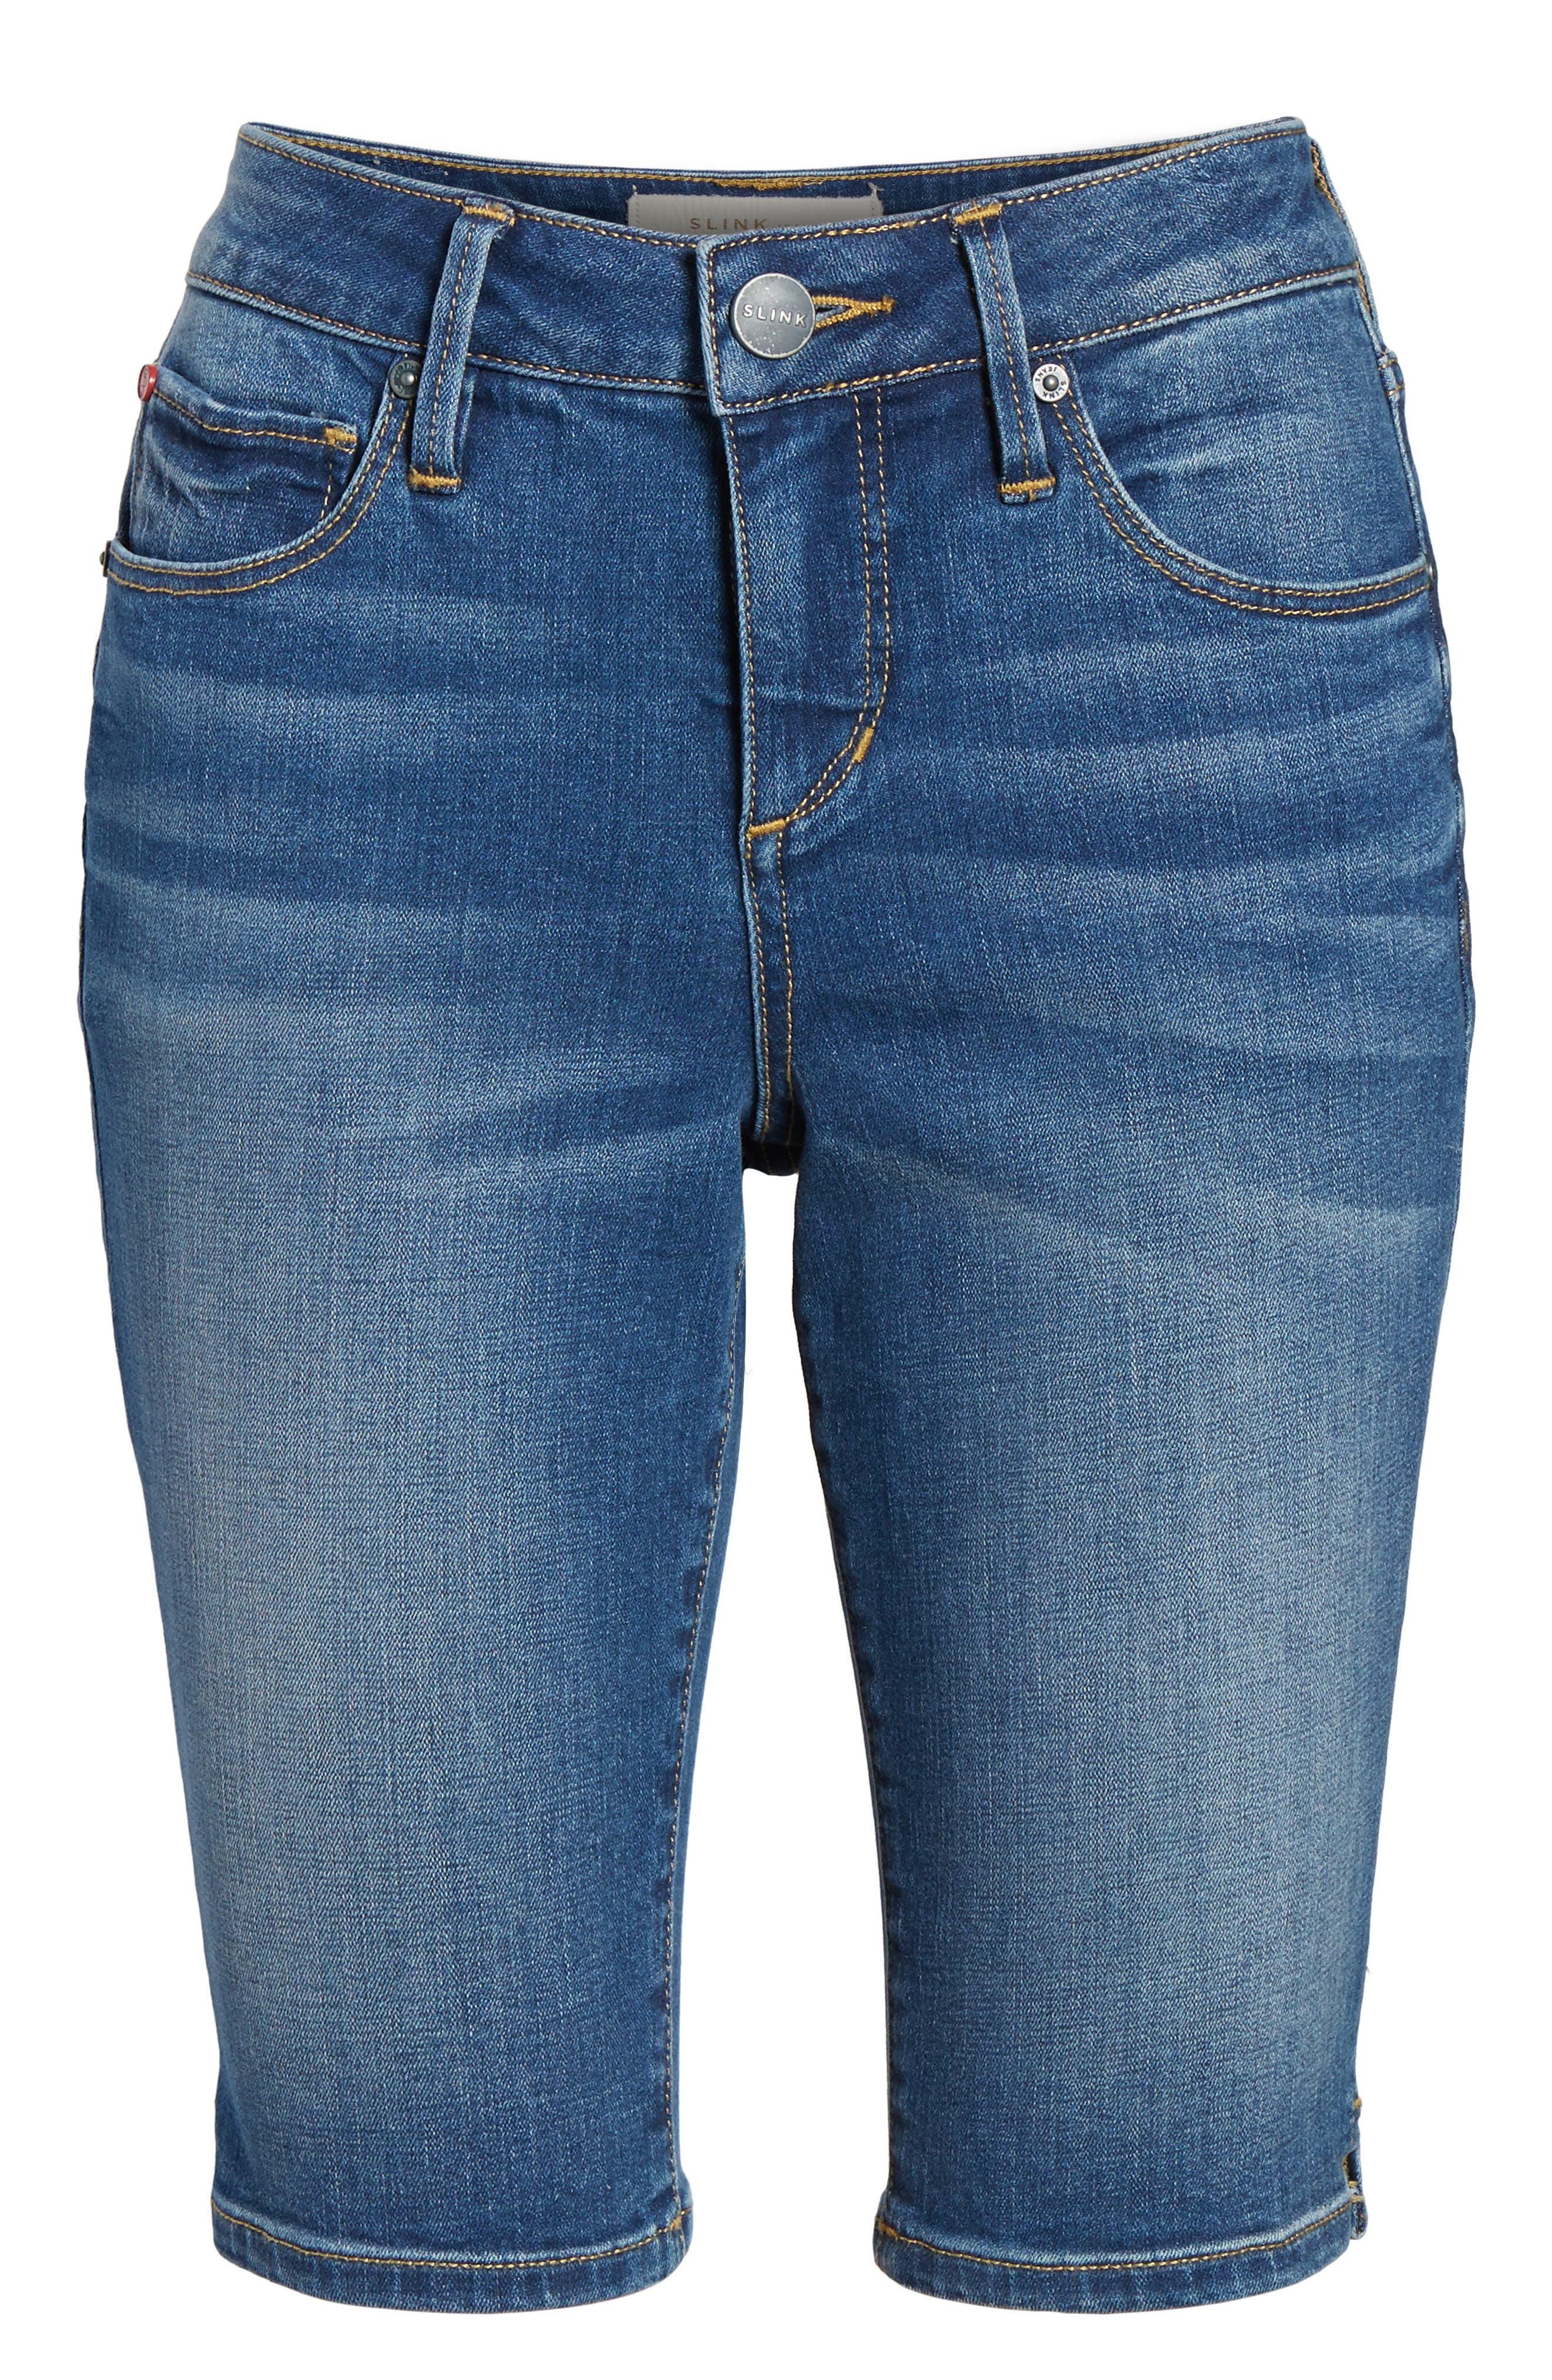 Bermuda Shorts,                             Alternate thumbnail 6, color,                             BIRDY